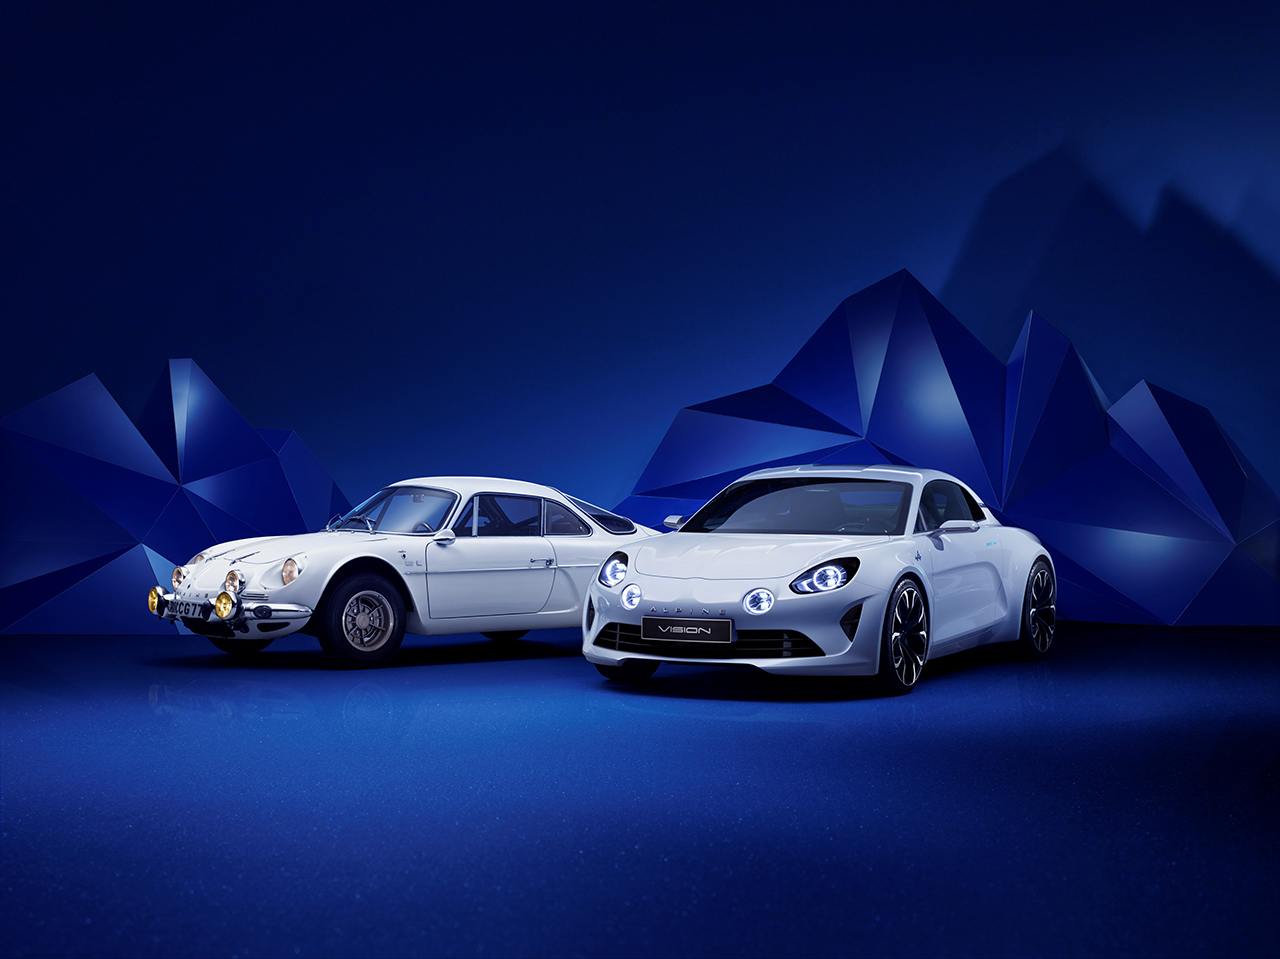 2016 Renault Alpine Vision Concept